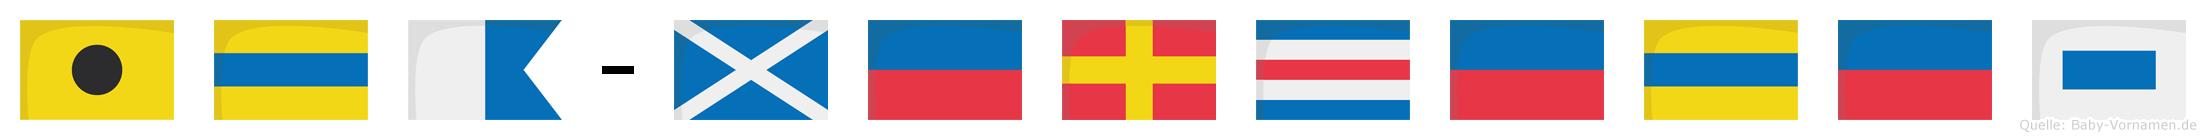 Ida-Mercedes im Flaggenalphabet